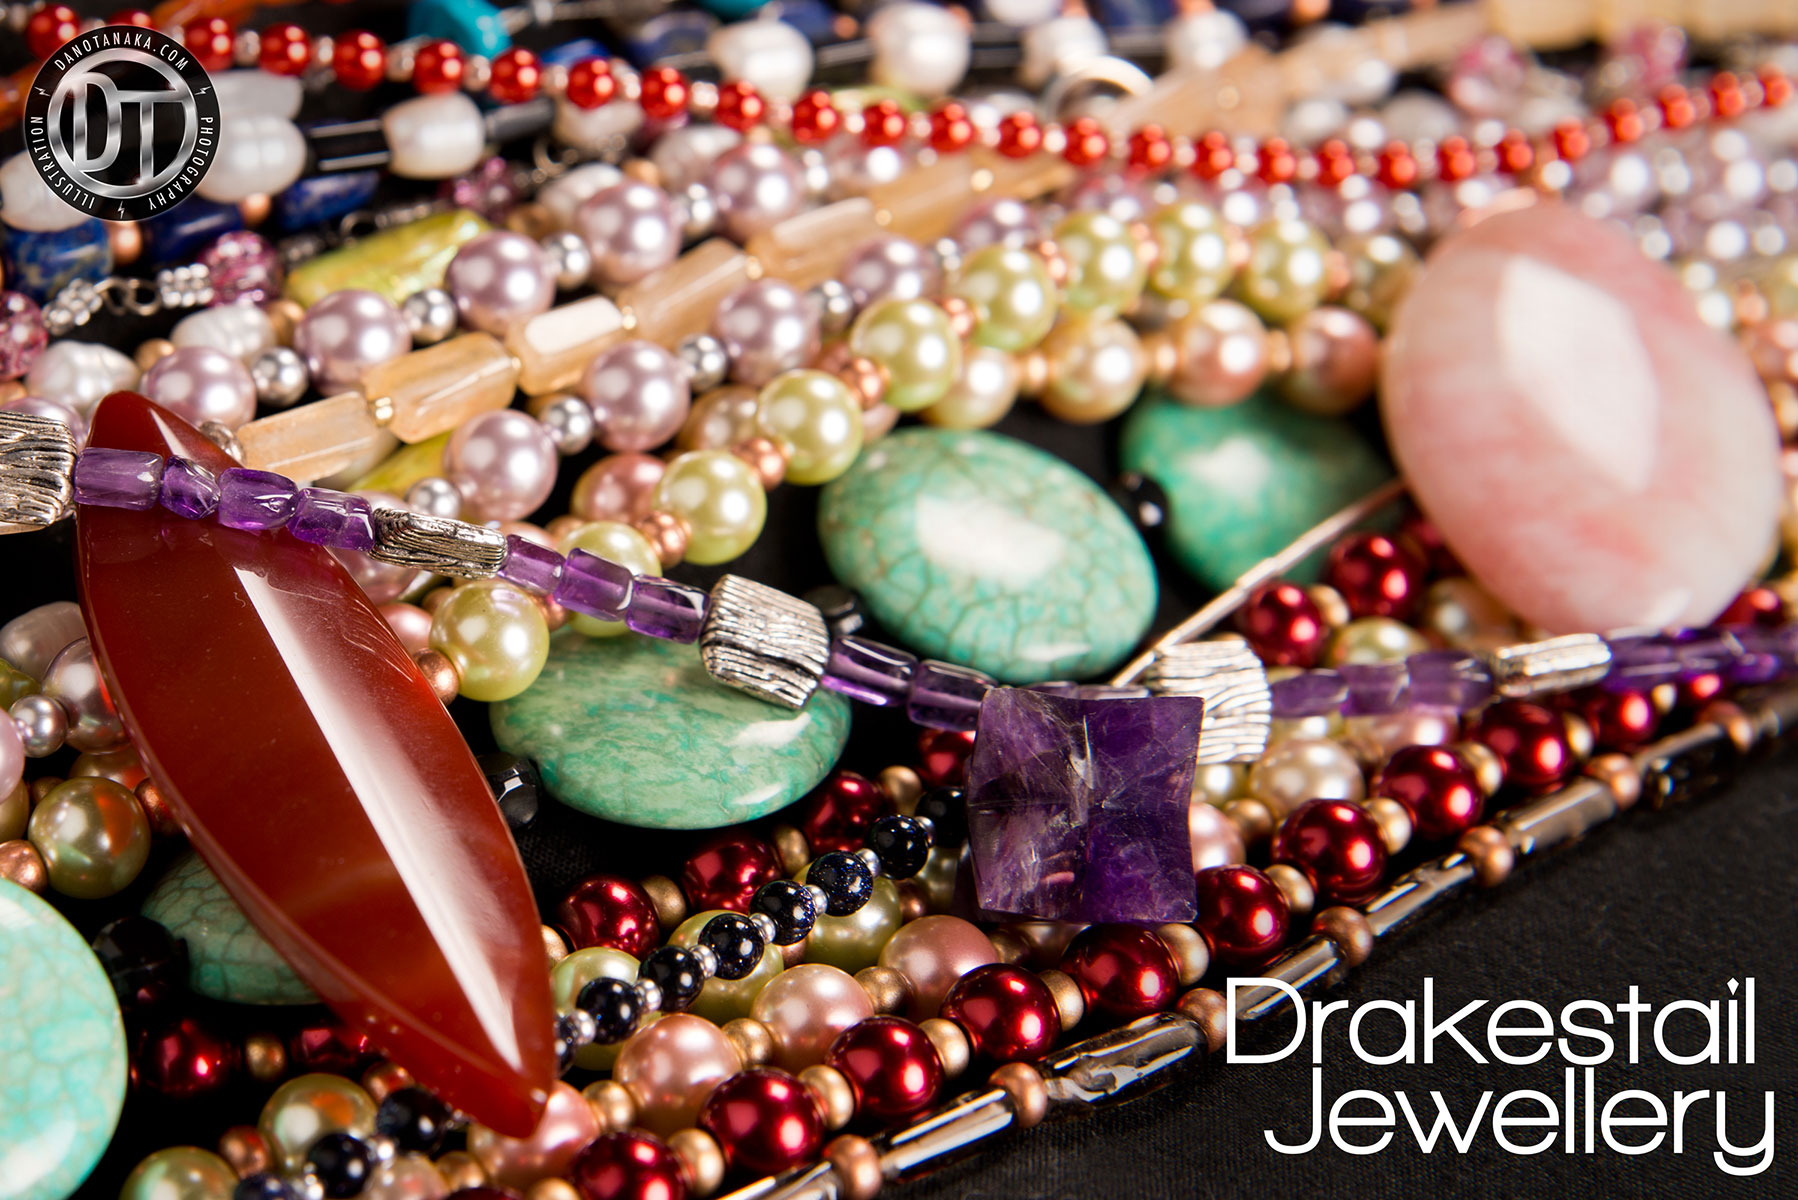 2013-08_DanoTanaka_Drakestail_Jewellery_01